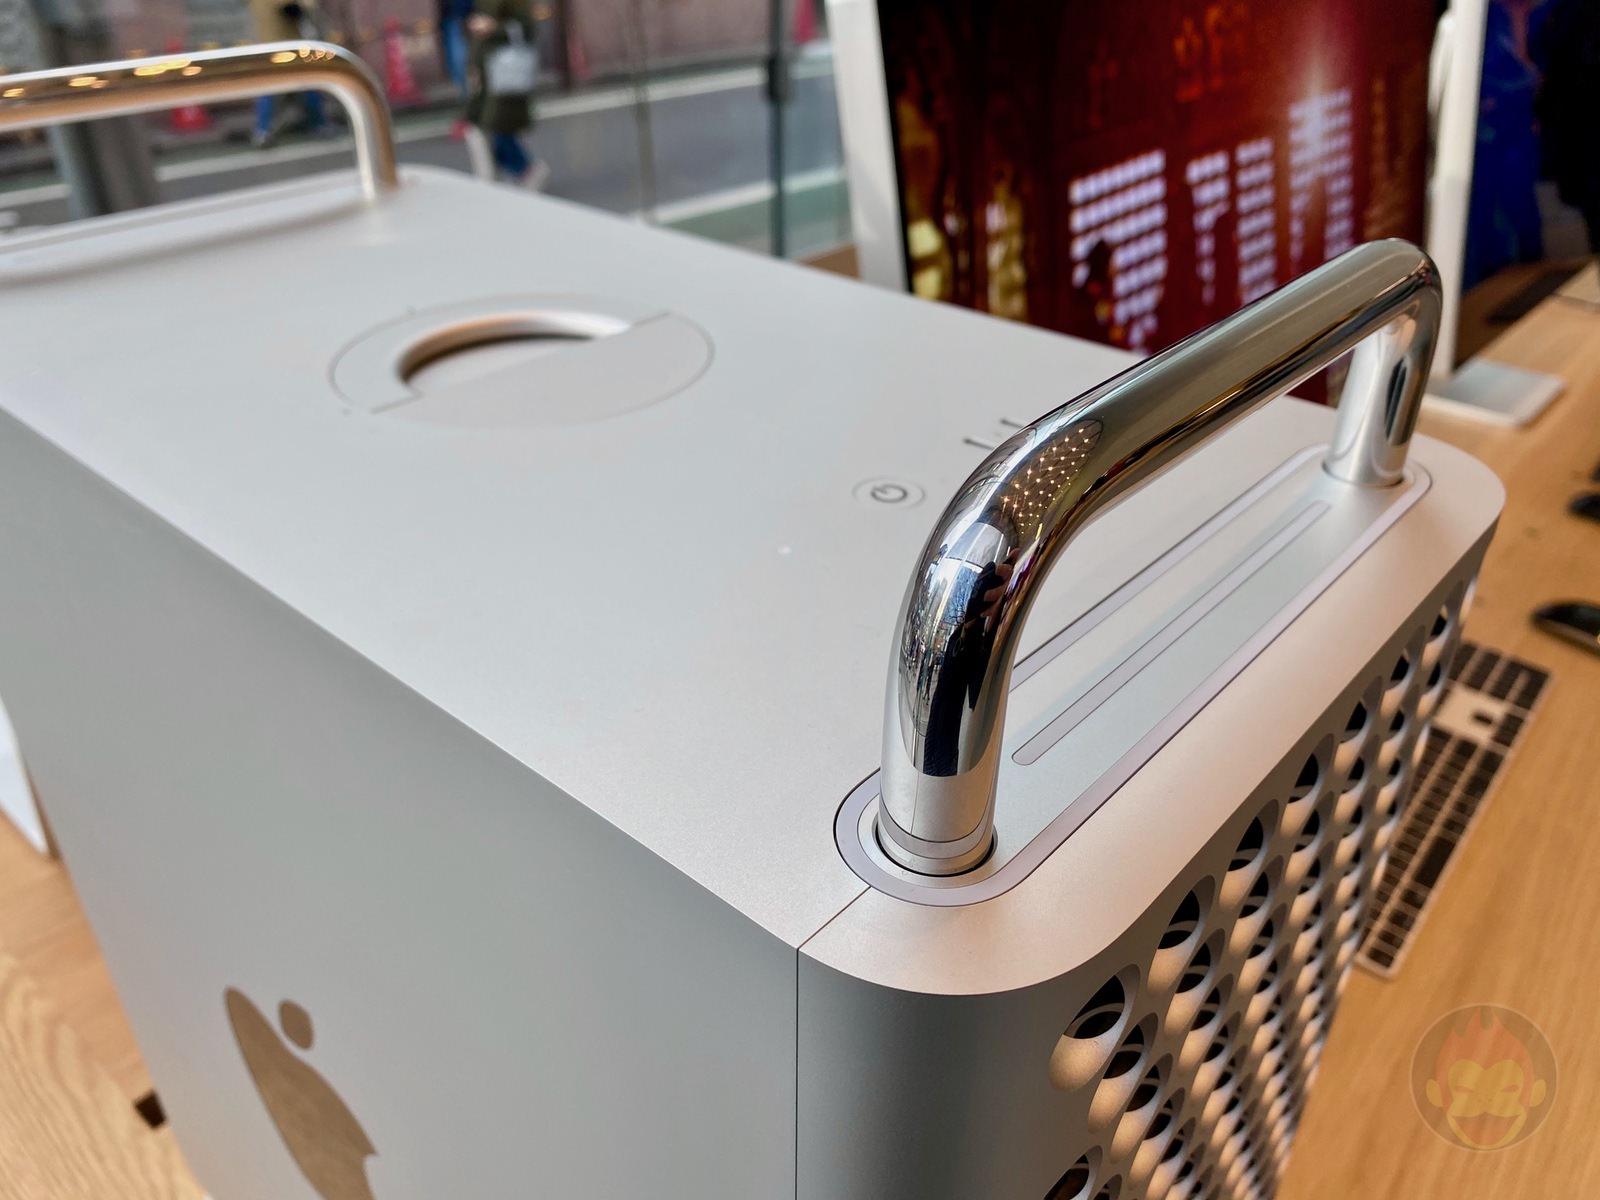 Mac Pro Pro Display XDR Apple Omotesando 07